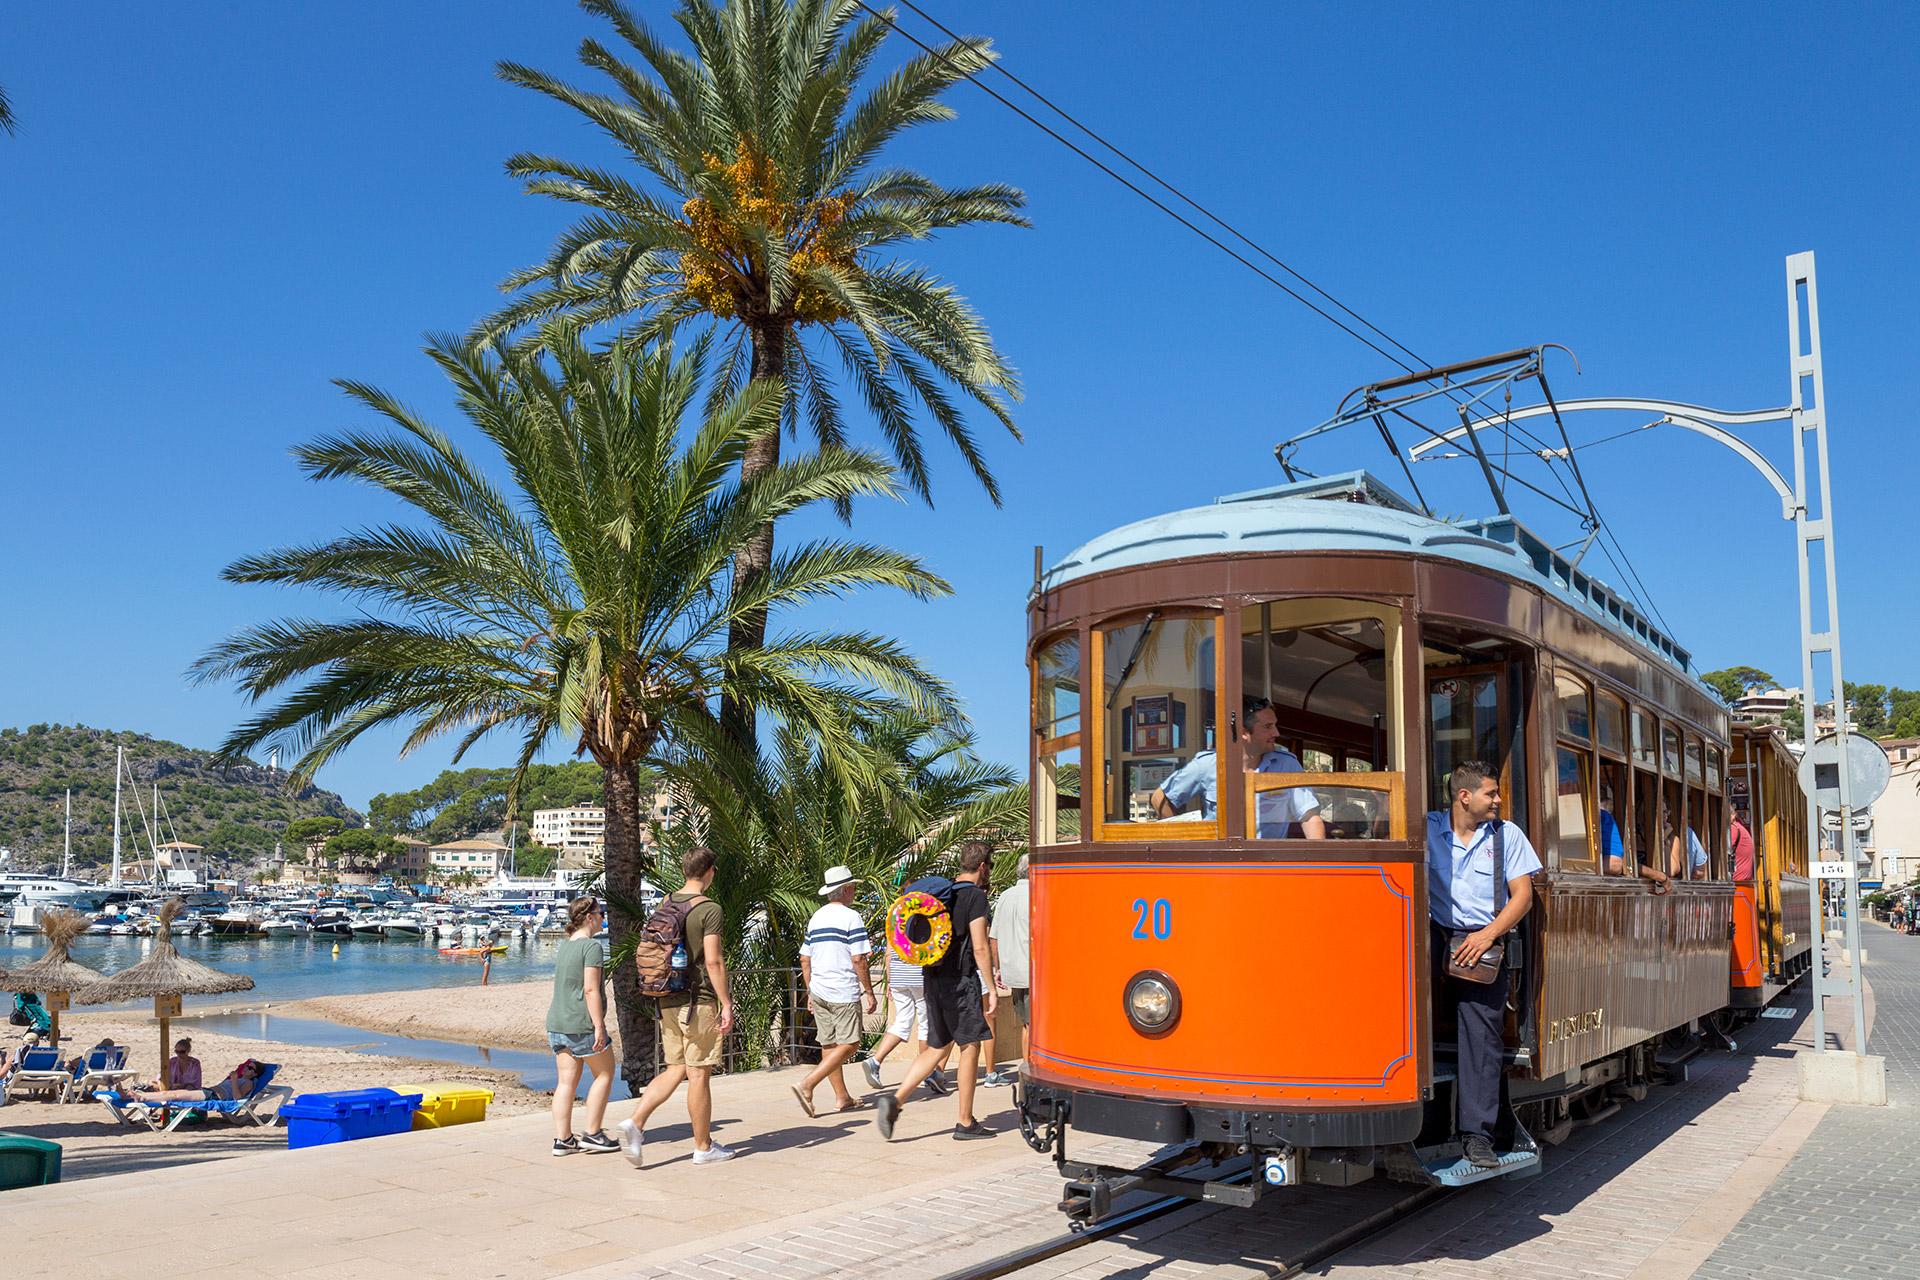 Sóllerin raitiovaunu. Port de Sóller, Mallorca © Tuulia Kolehmainen